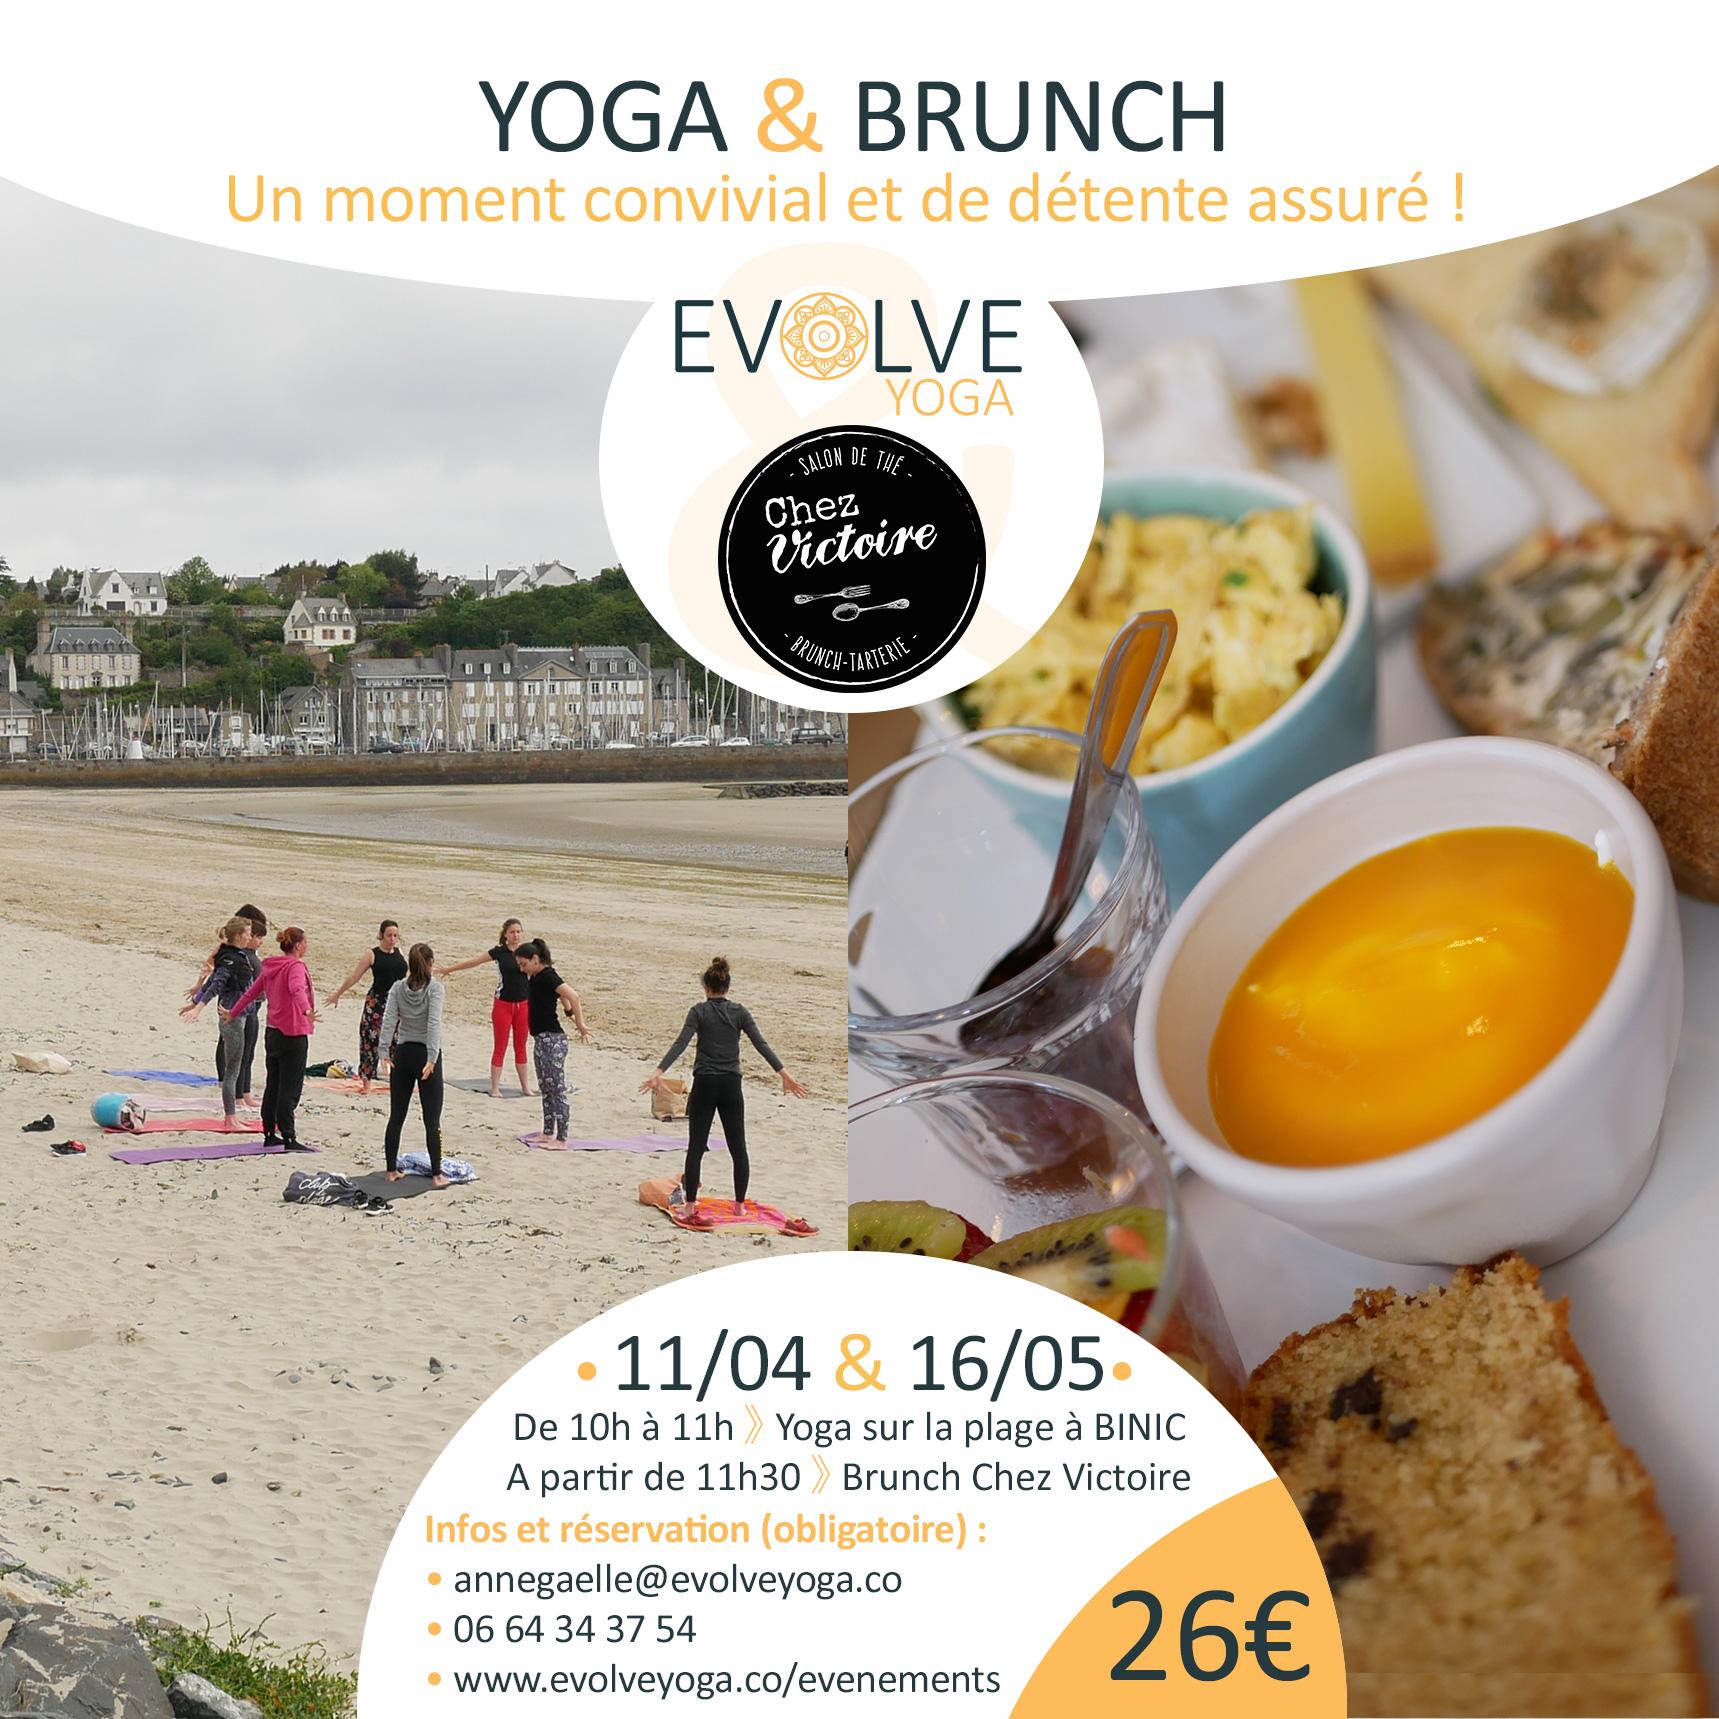 Yoga'Brunch ▲ 11/04 ▽ BINIC, FRANCE